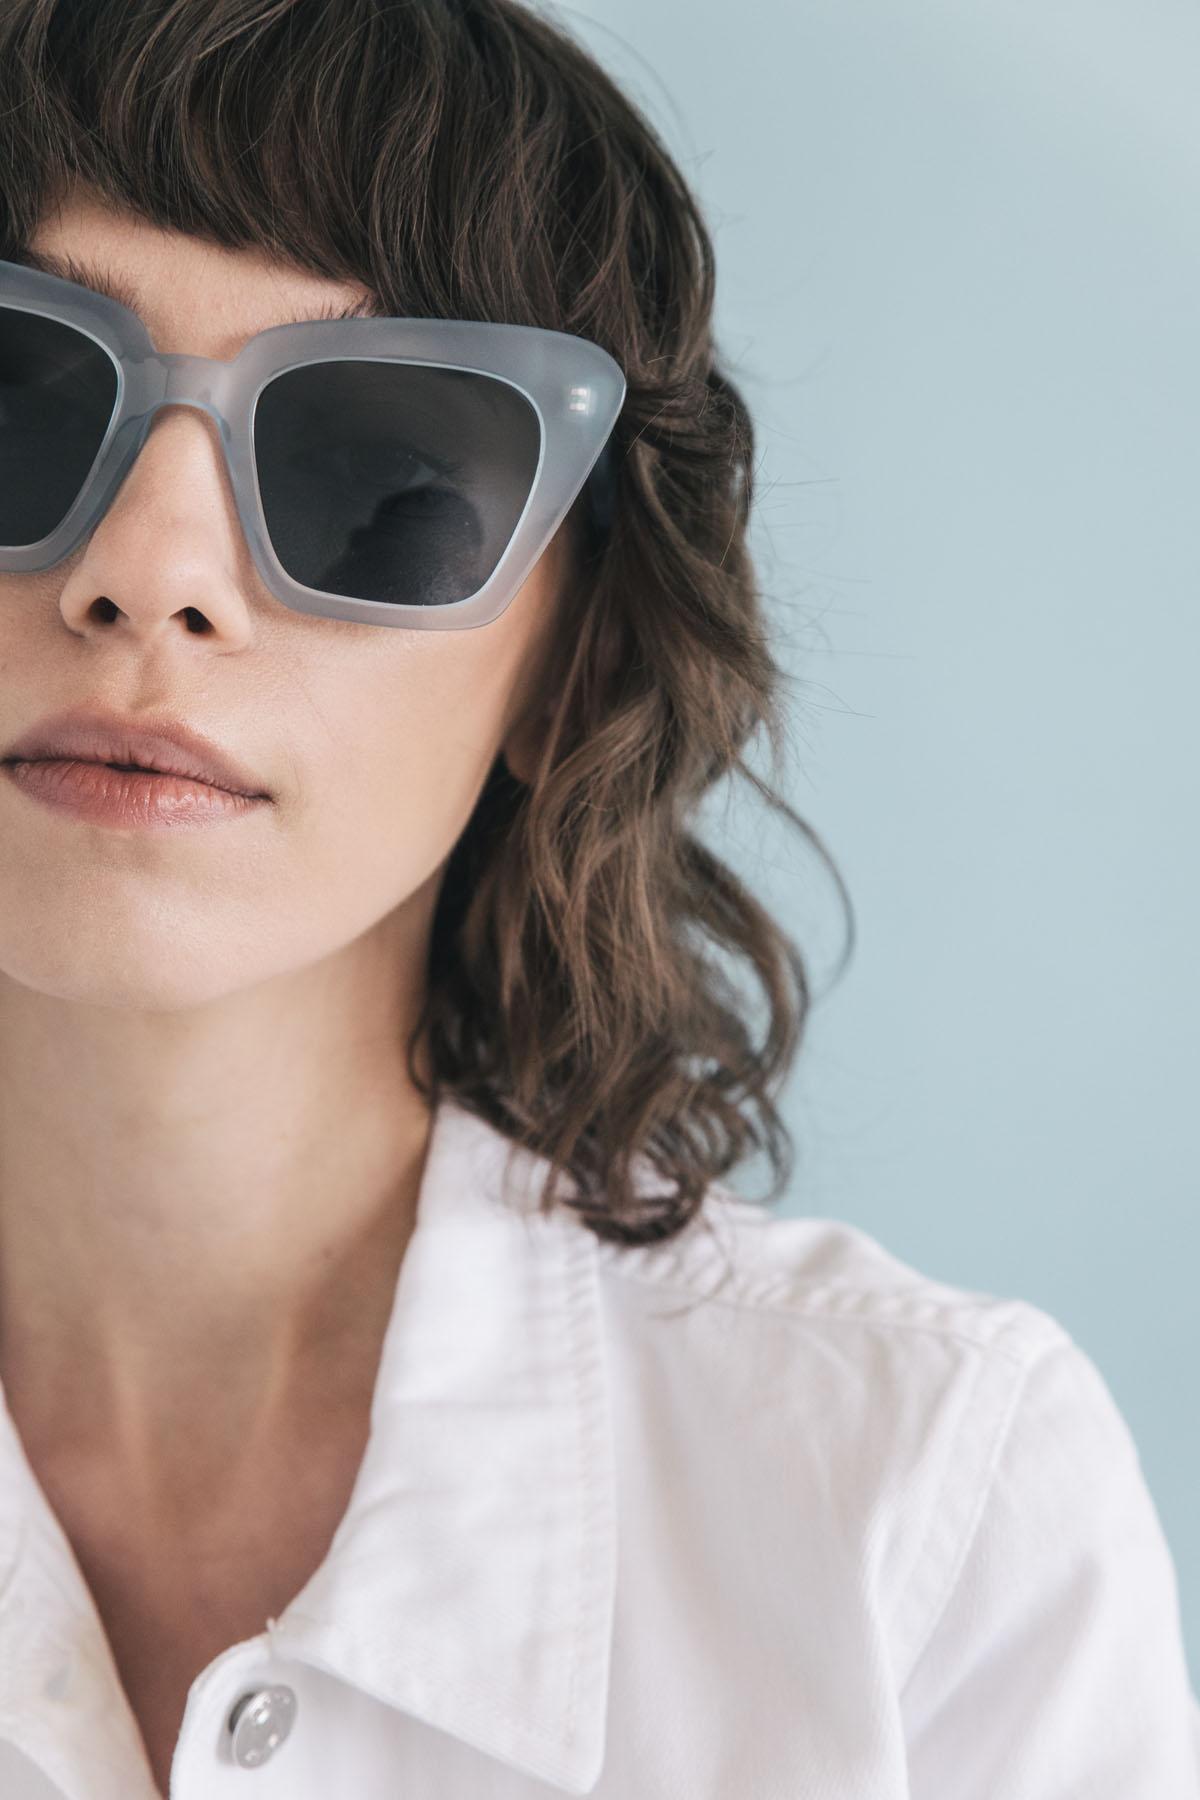 Lowercase Eyewear 2018 Spring / Summer collection. | Design